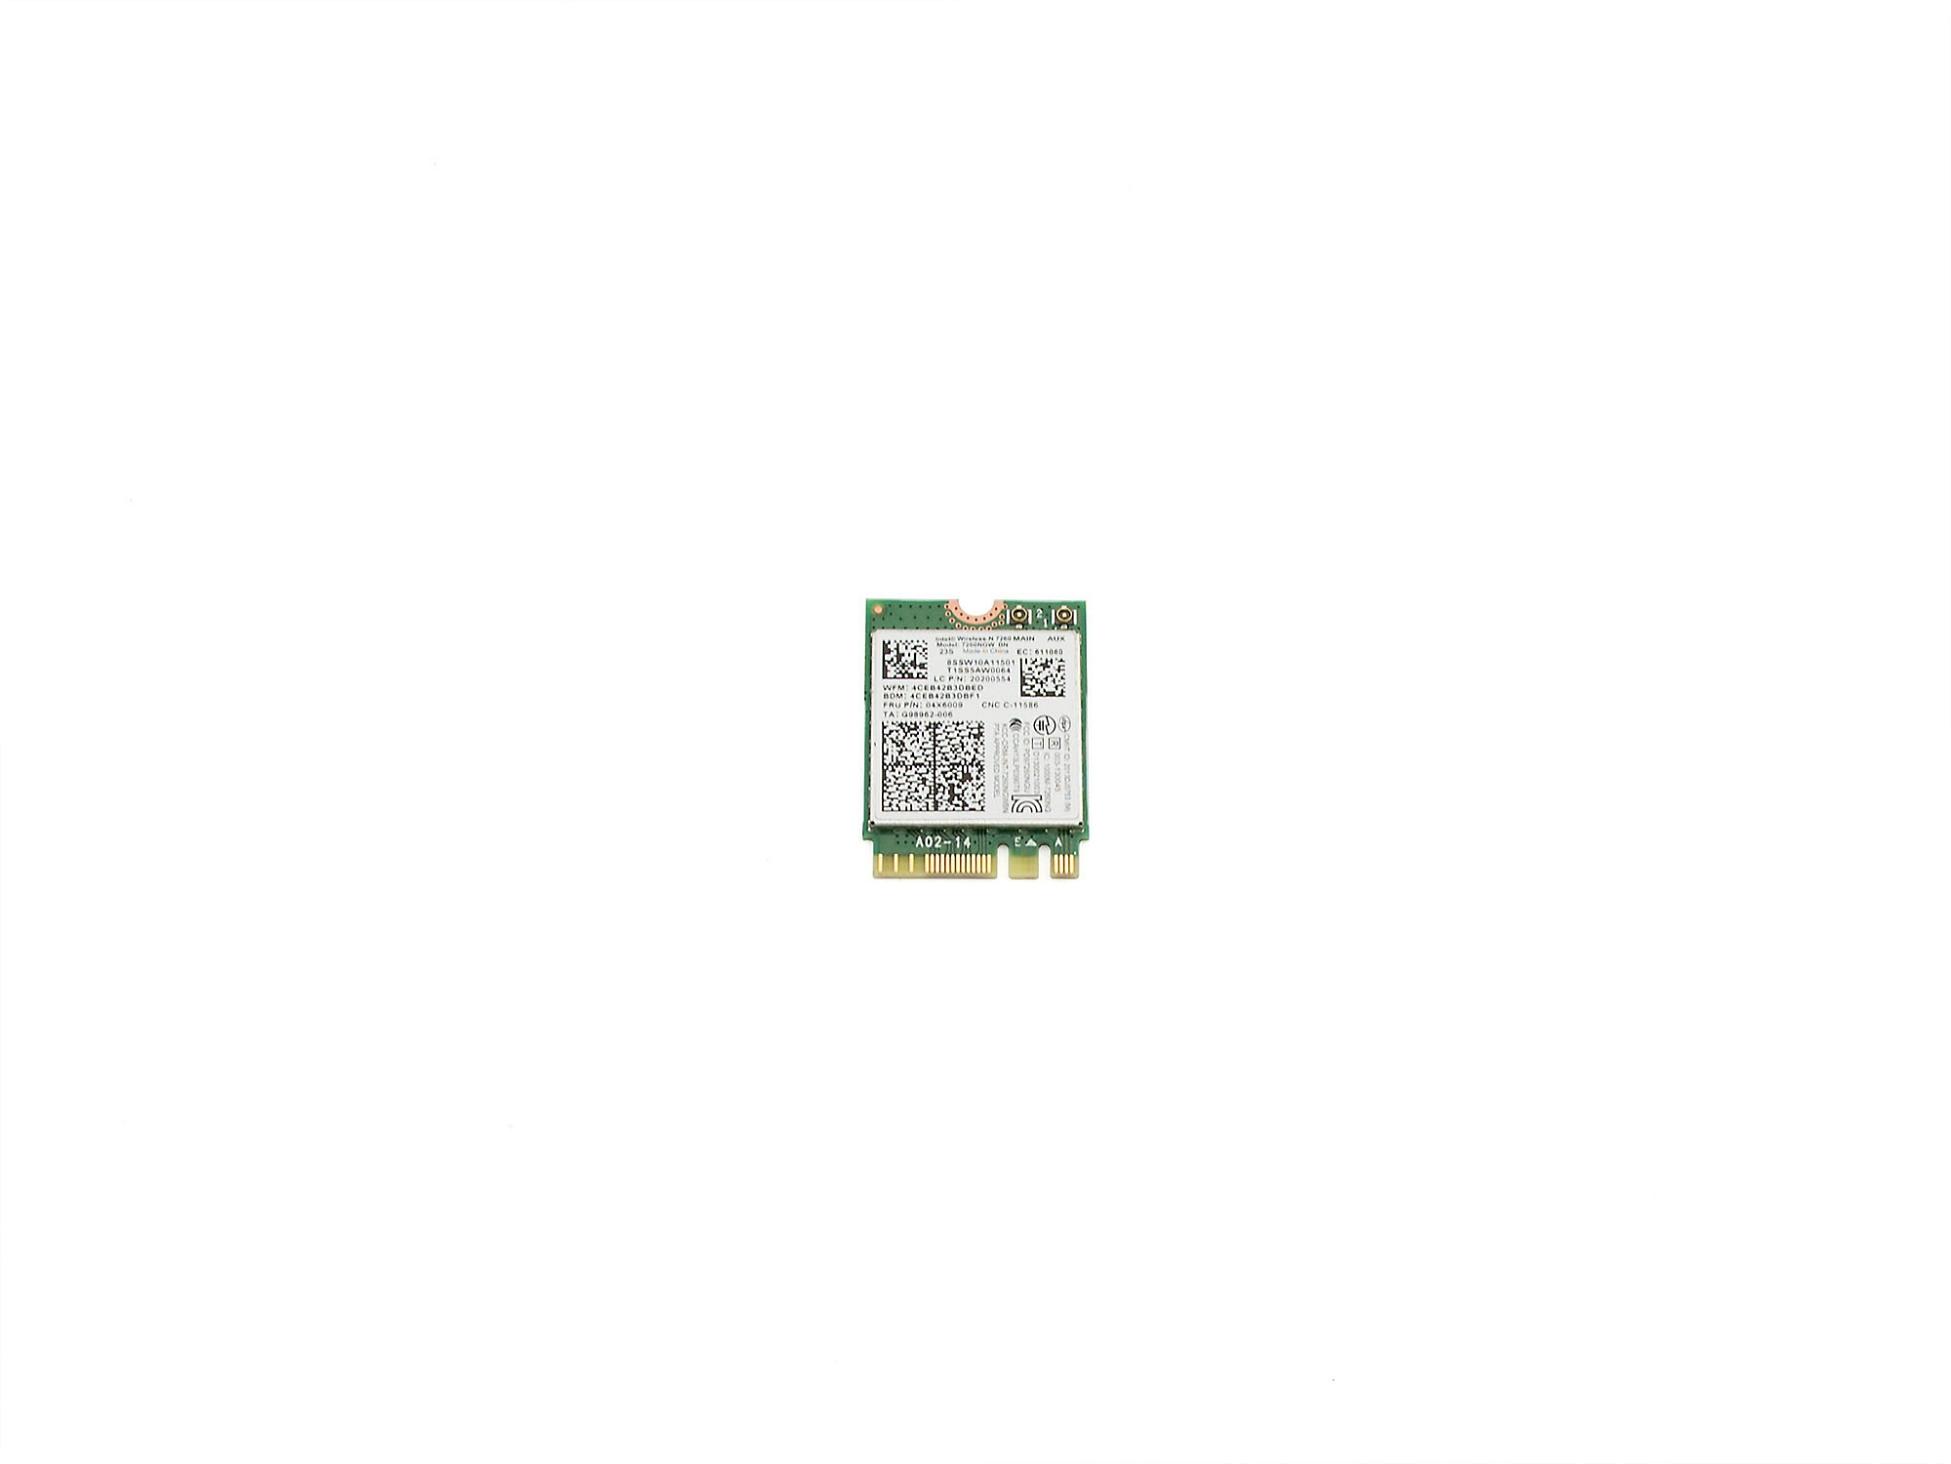 Intel Wireless-N 7260 MAIN für Lenovo ThinkPad X240 (20AM) Serie